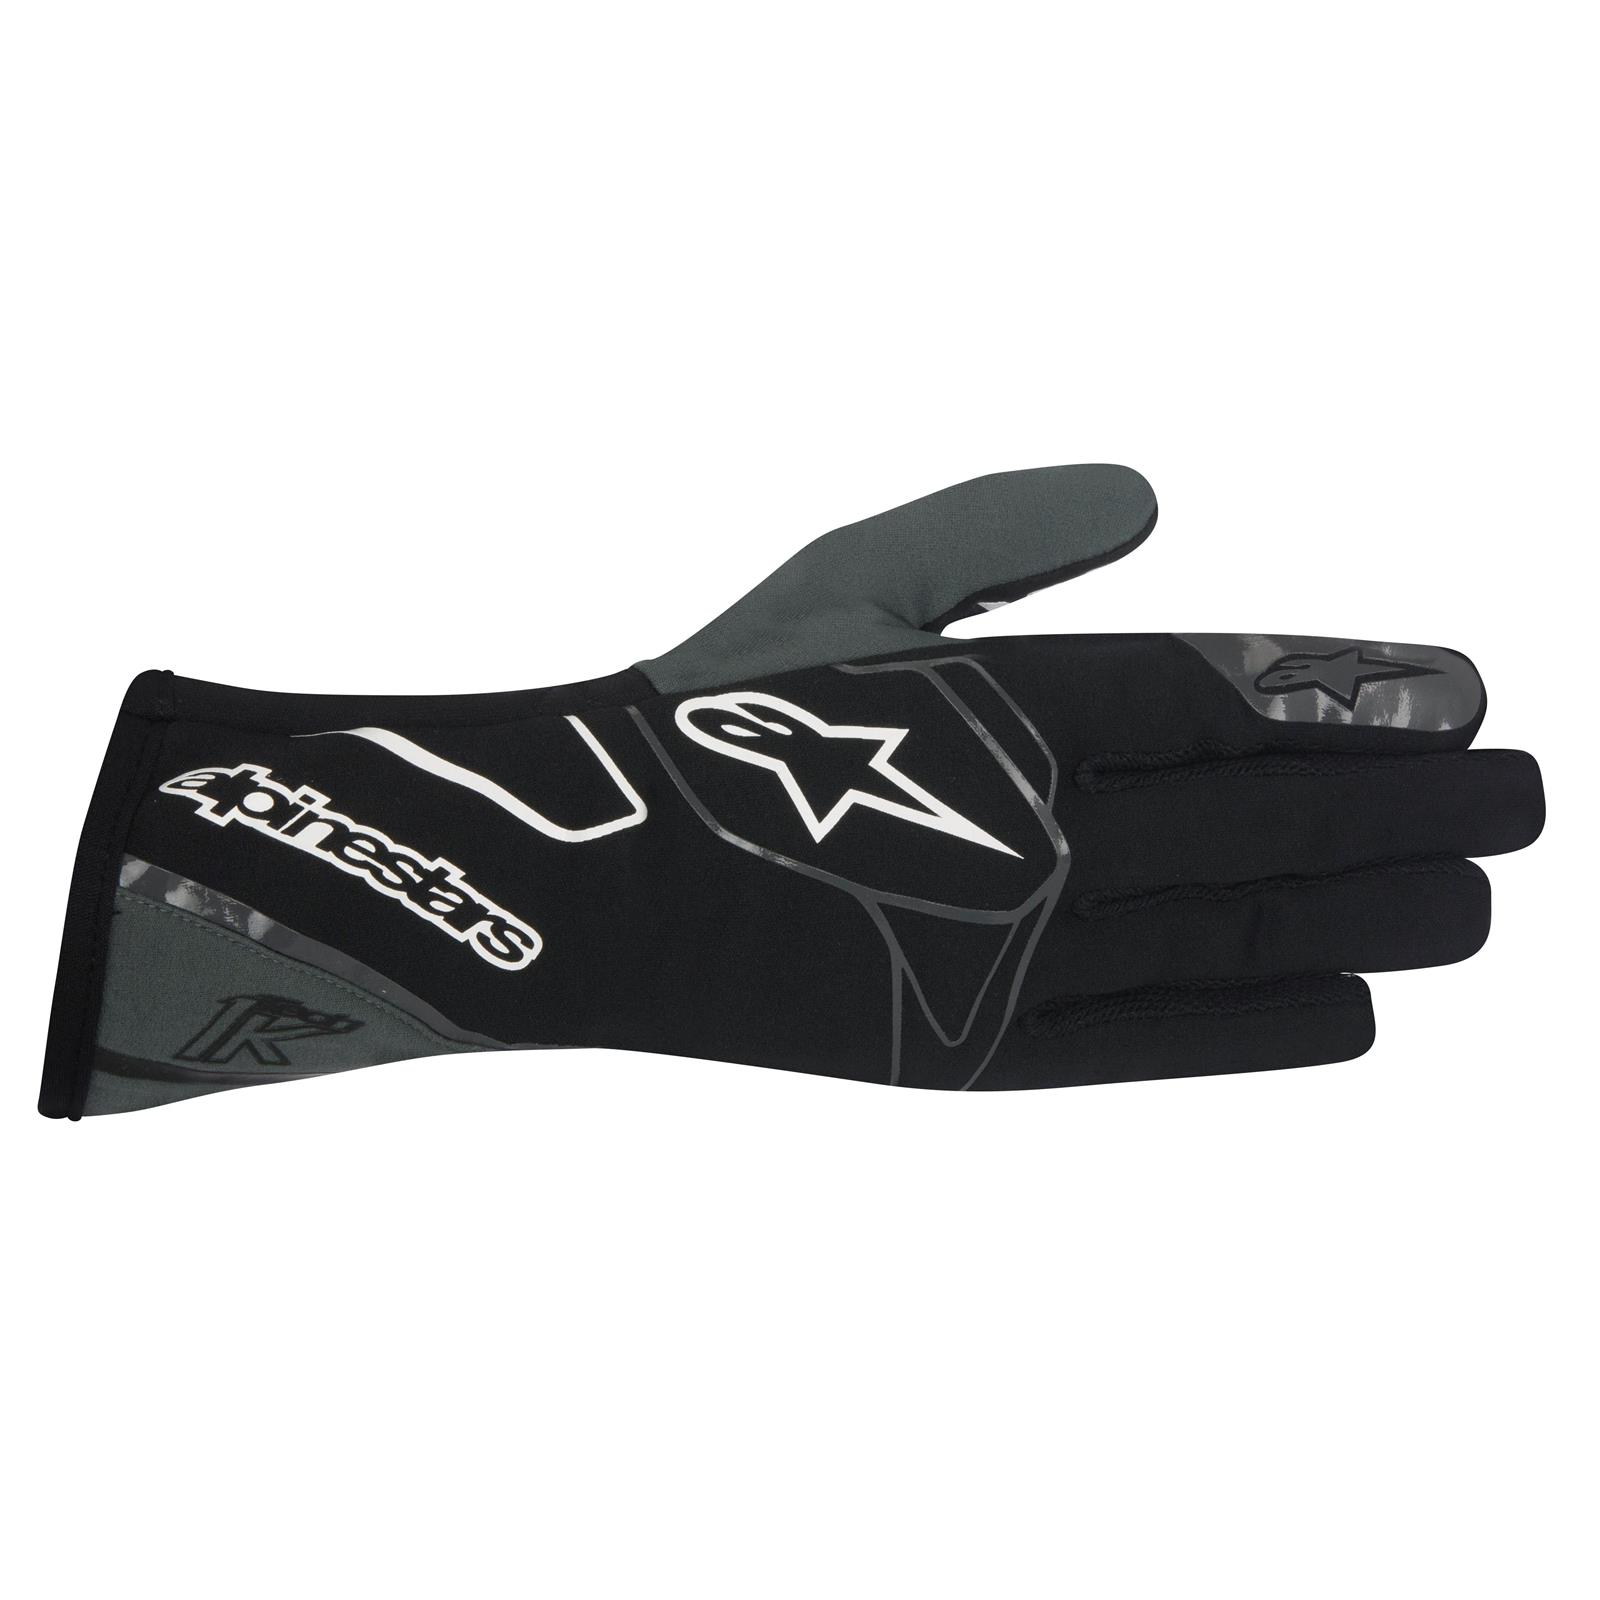 Adult Green Skeleton XS-XL go Kart Driver Racing Karting Driving Gloves